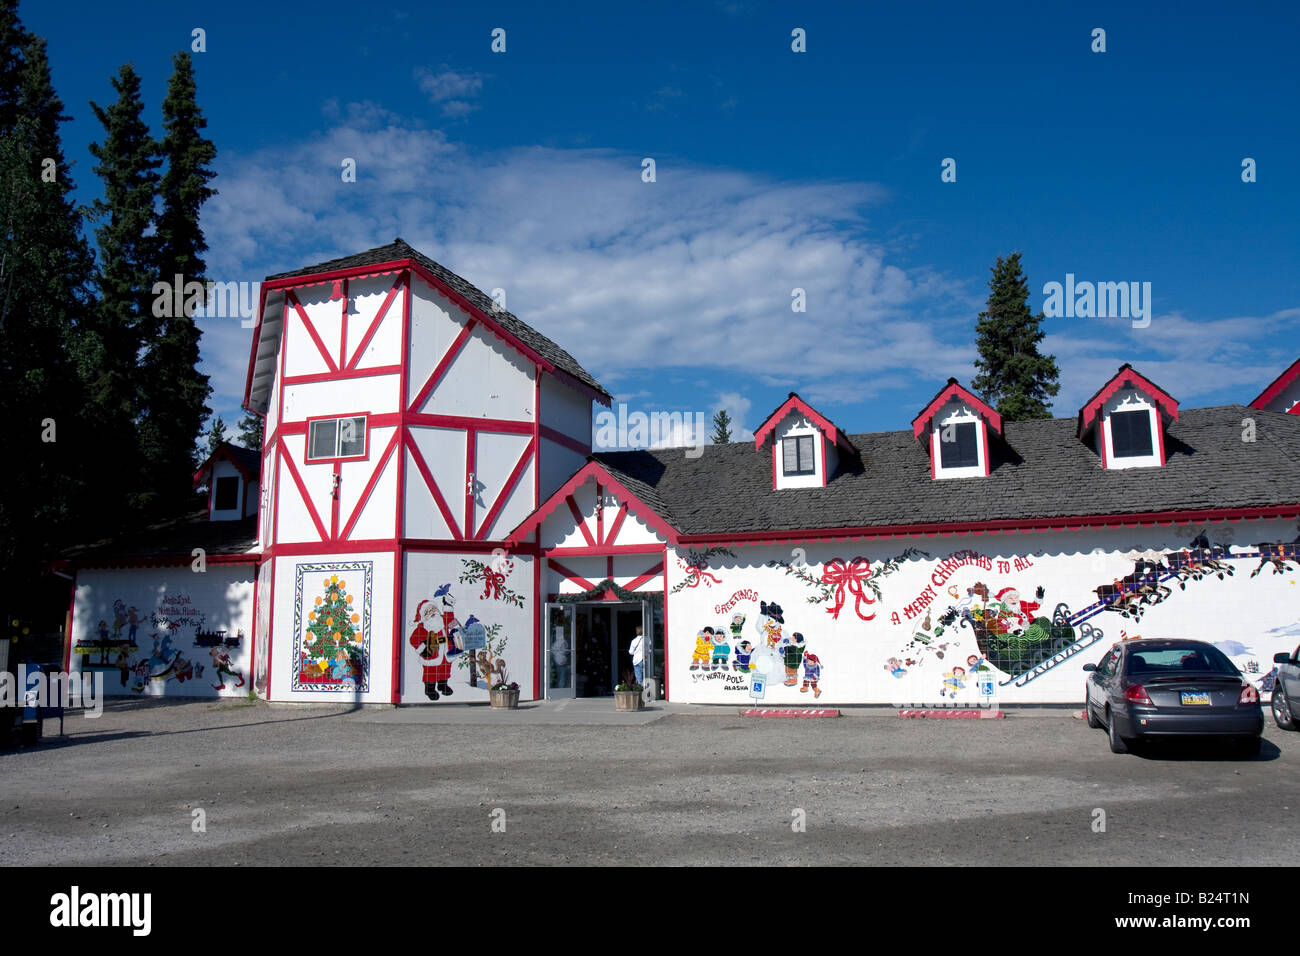 Santa Claus, father Christmas at North pole, Alaska Stock Photo